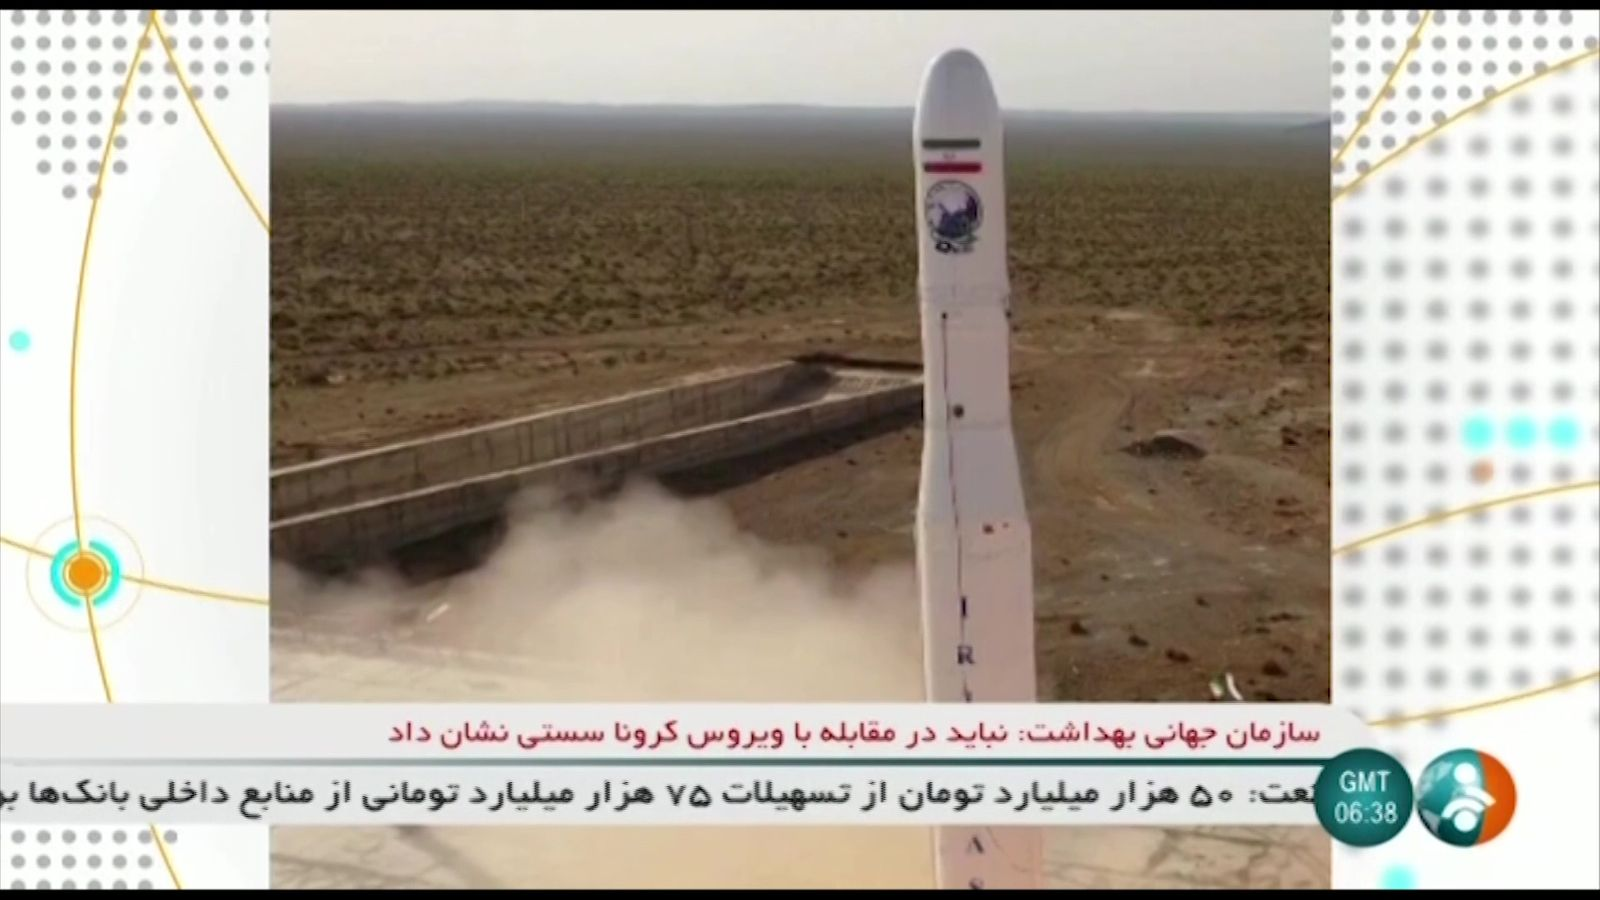 IRAN-MILITARY-SATELLITE